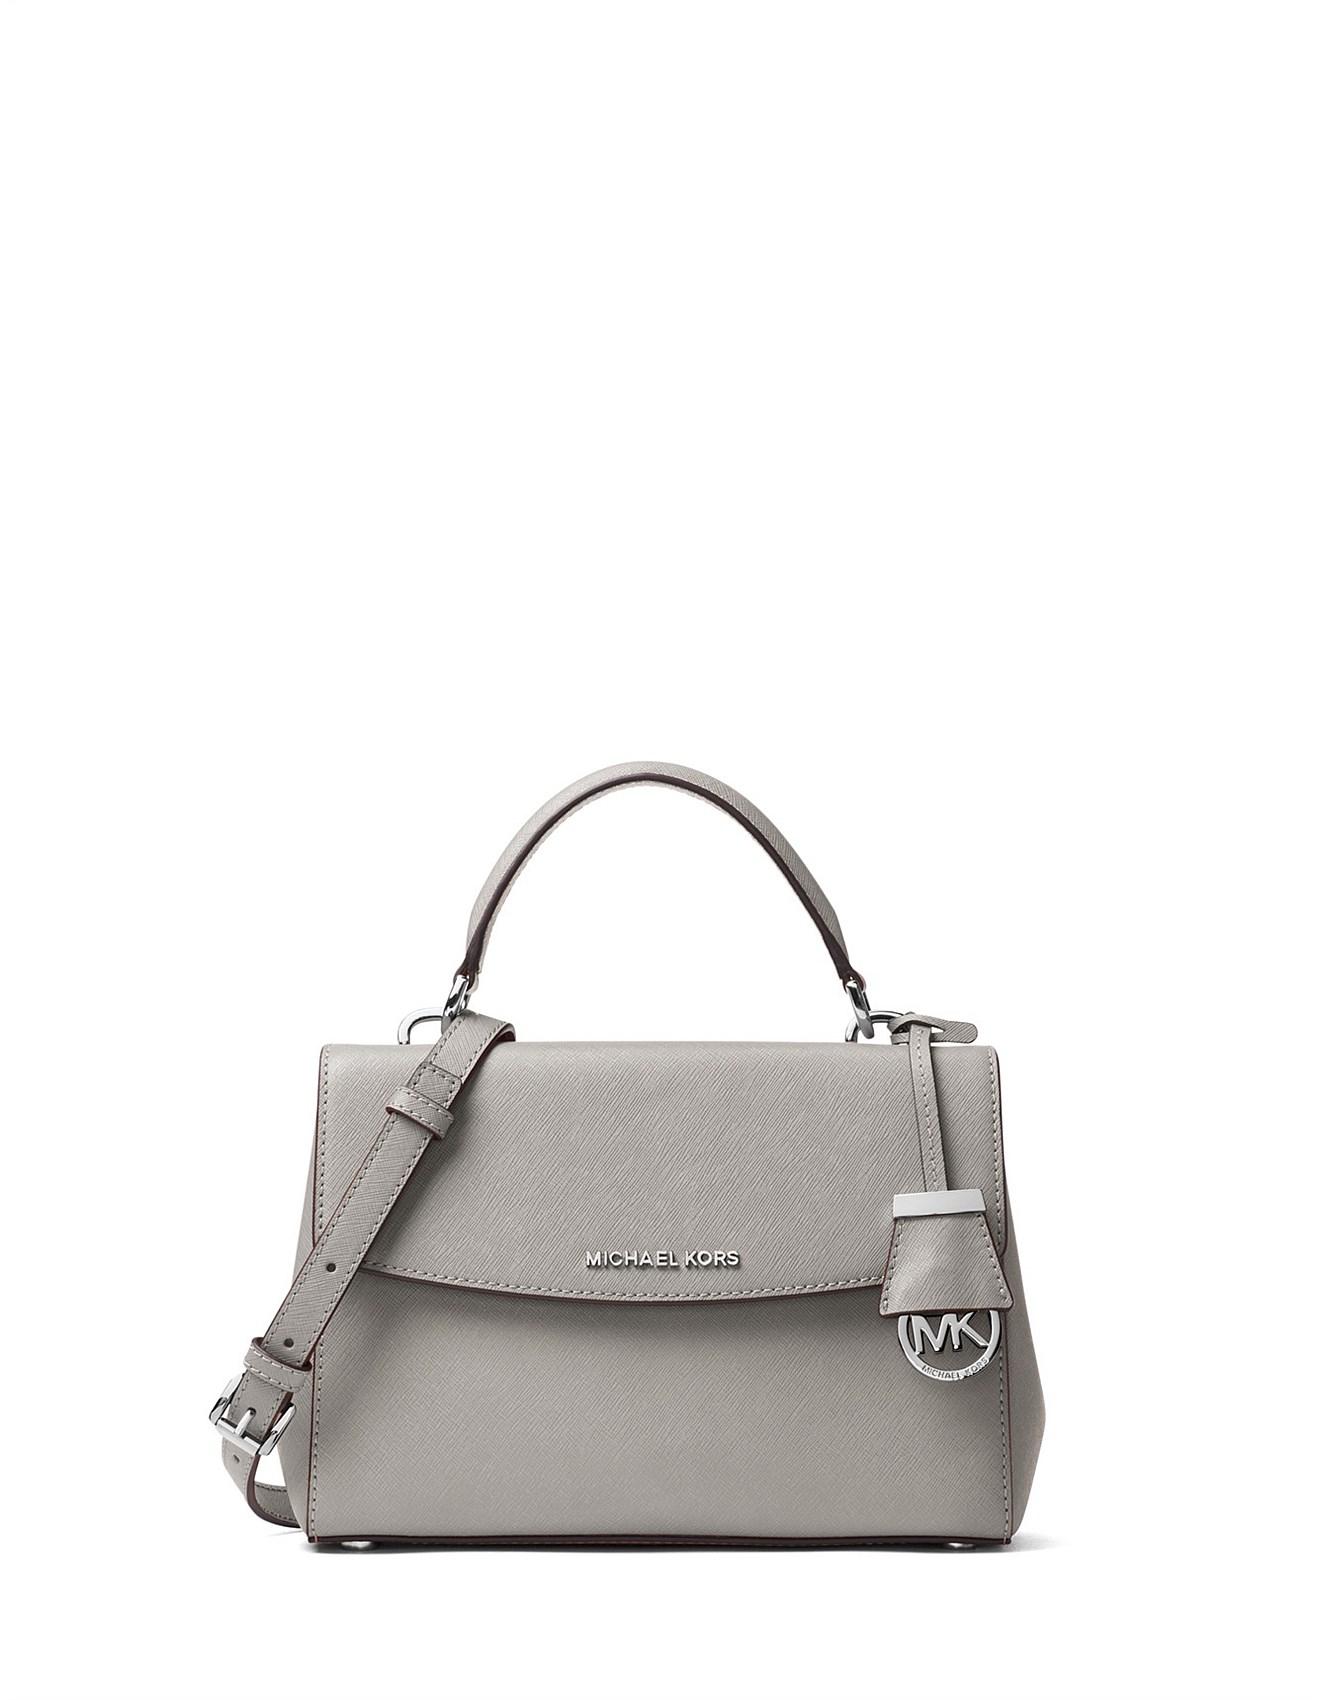 1313547ffce1 Ava Small Saffiano Leather Satchel